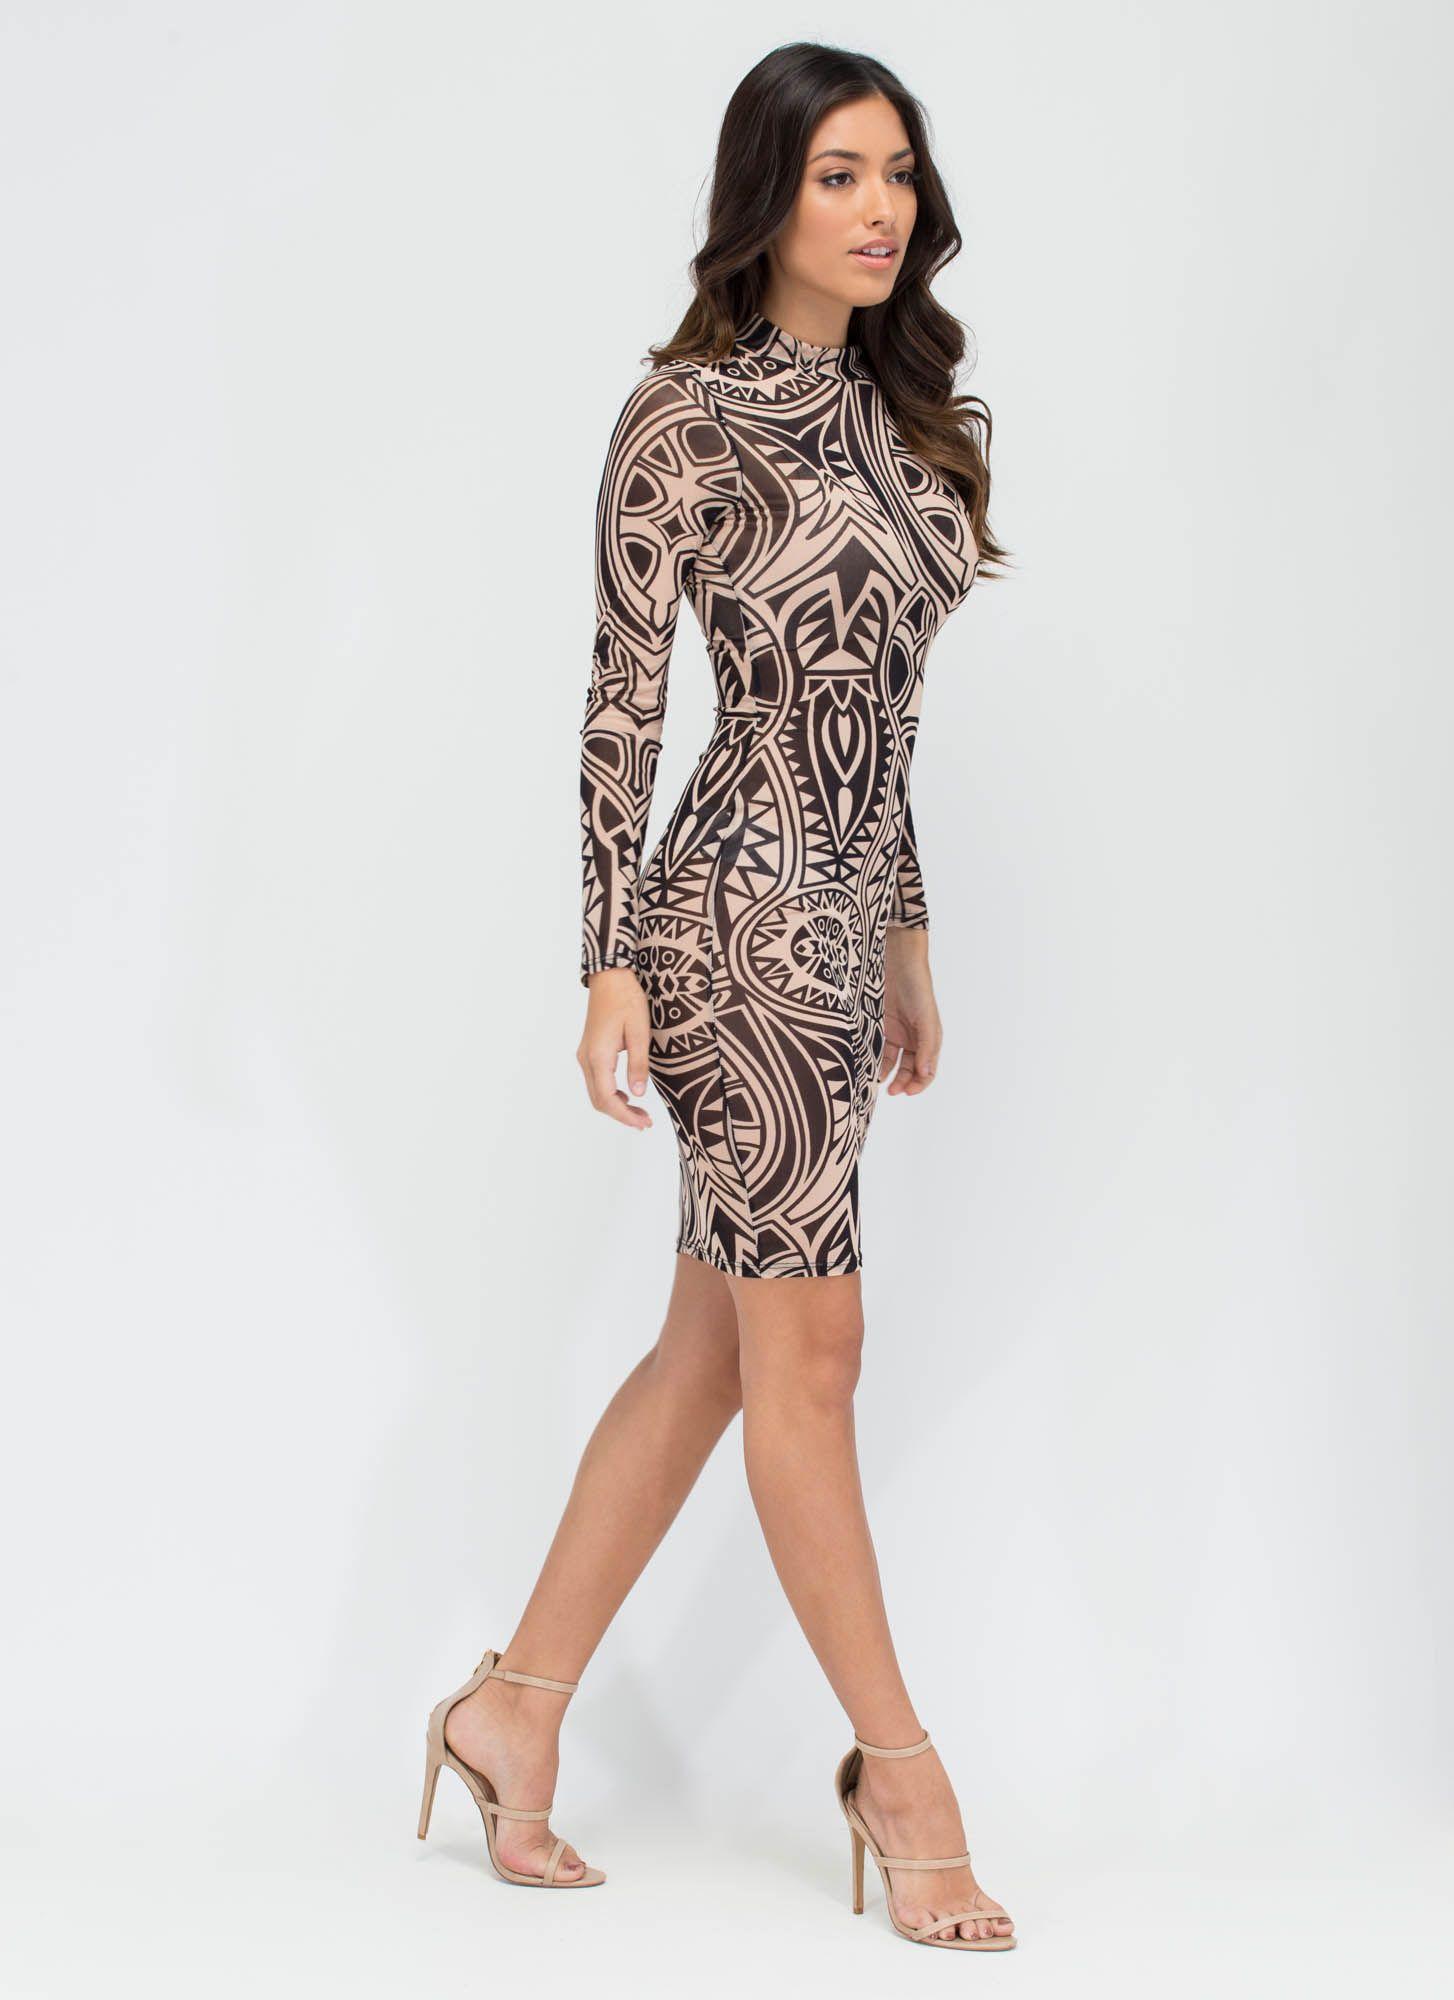 Tattoo Parlor Sheer Patterned Midi Dress Blacktaupe Gojane